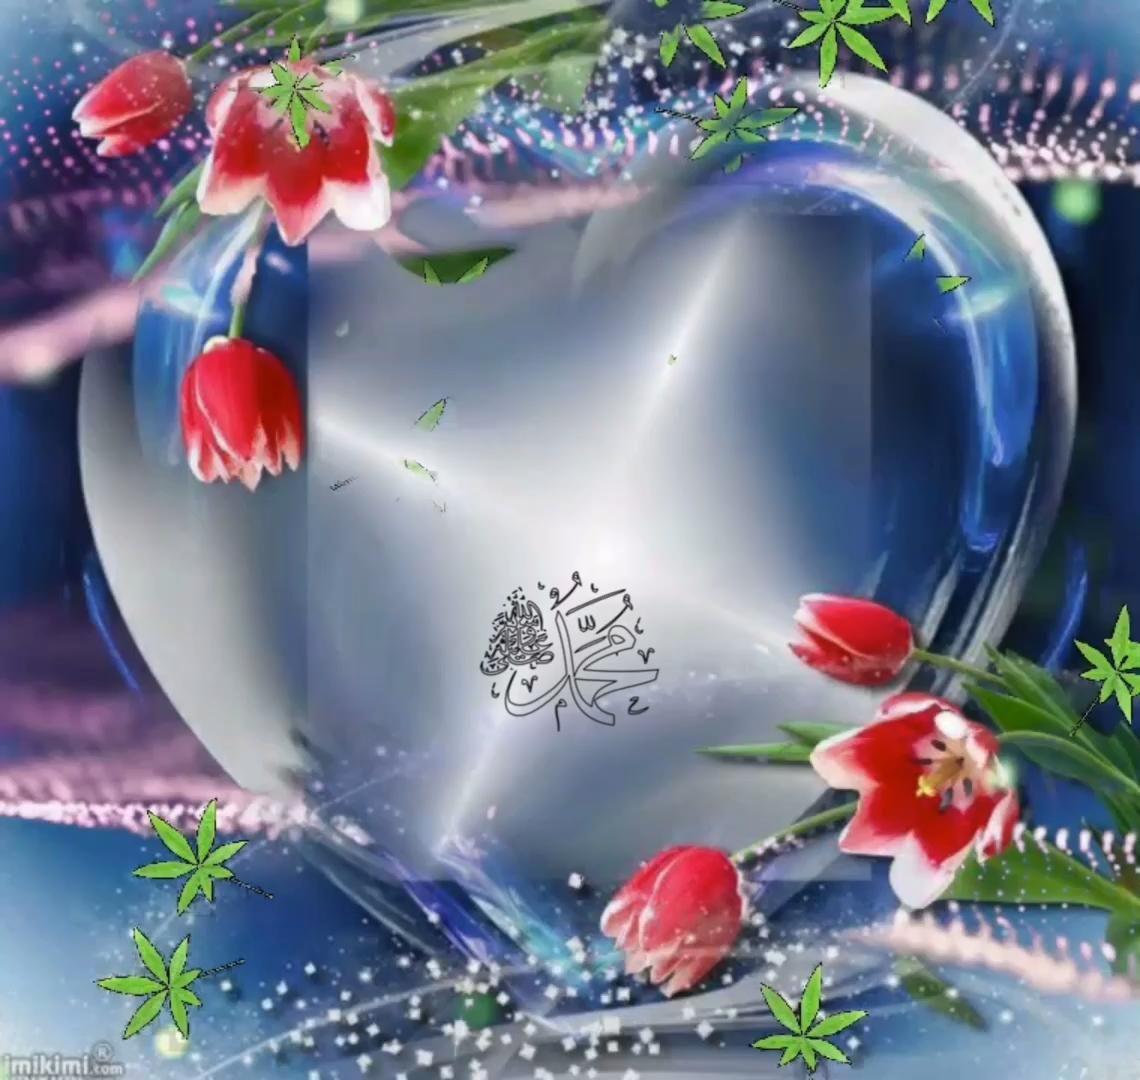 Islamic Video In 2020 Good Night Flowers Jumma Mubarak Images Islamic Wallpaper